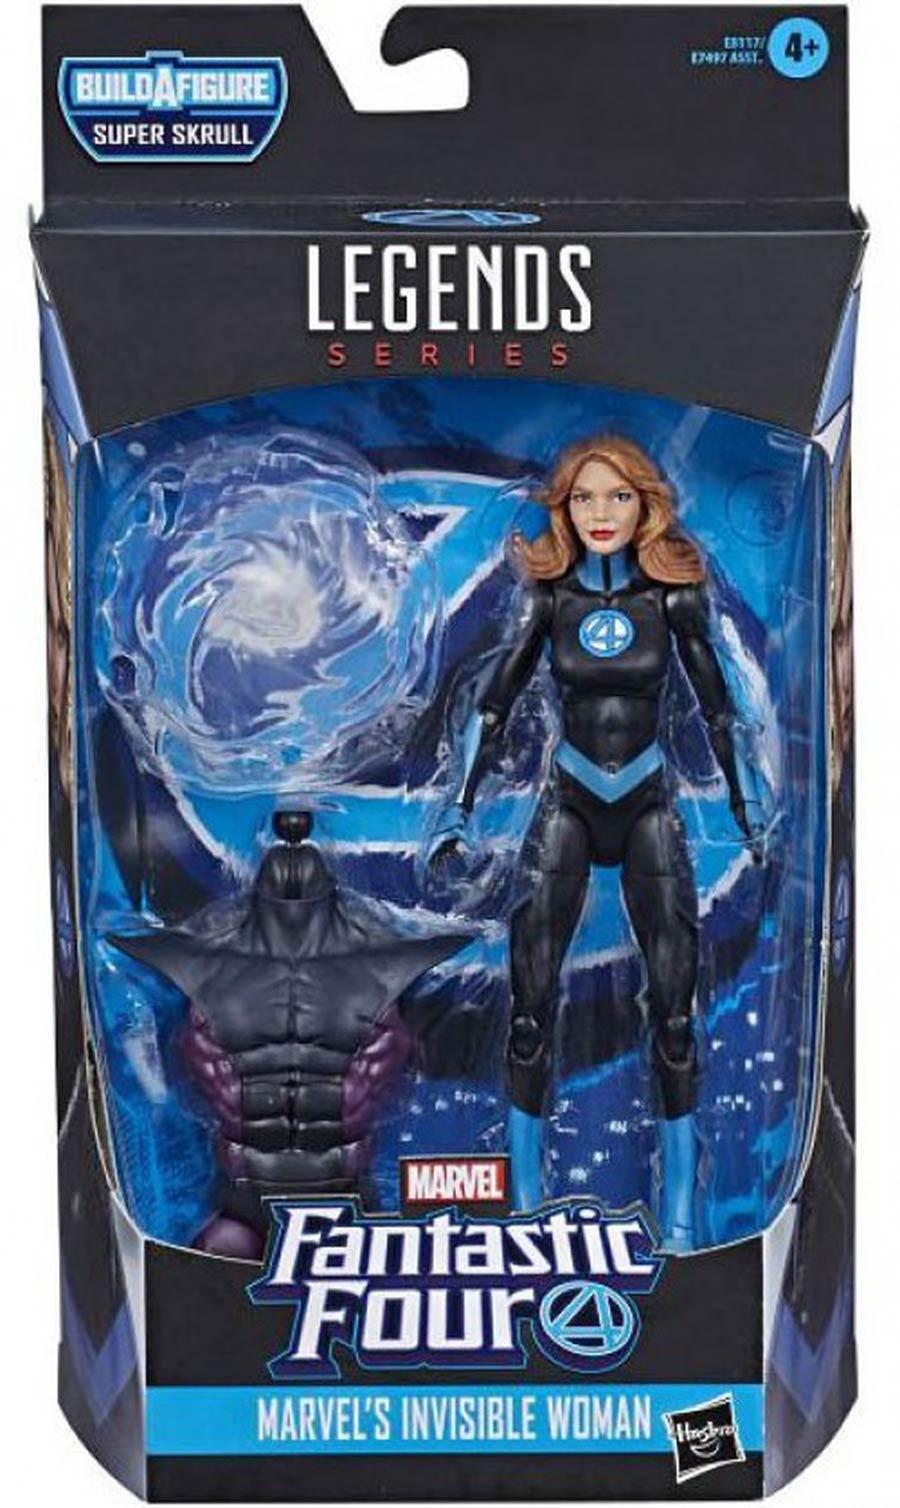 Marvel Fantastic Four Legends 2019 6-inch Action Figure - Invisible Woman